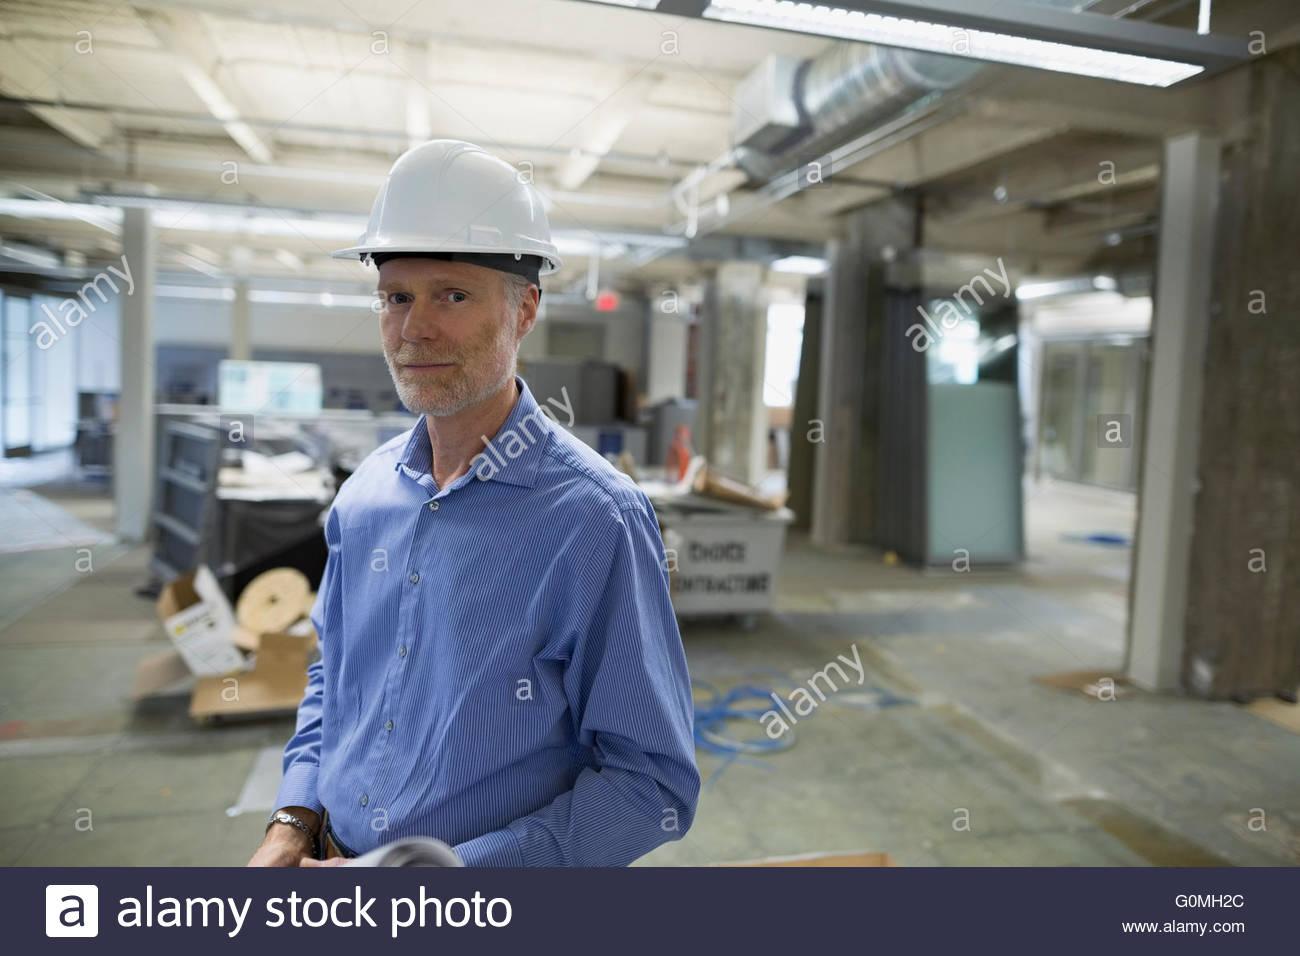 Portrait confident architect in hard-hat construction site - Stock Image